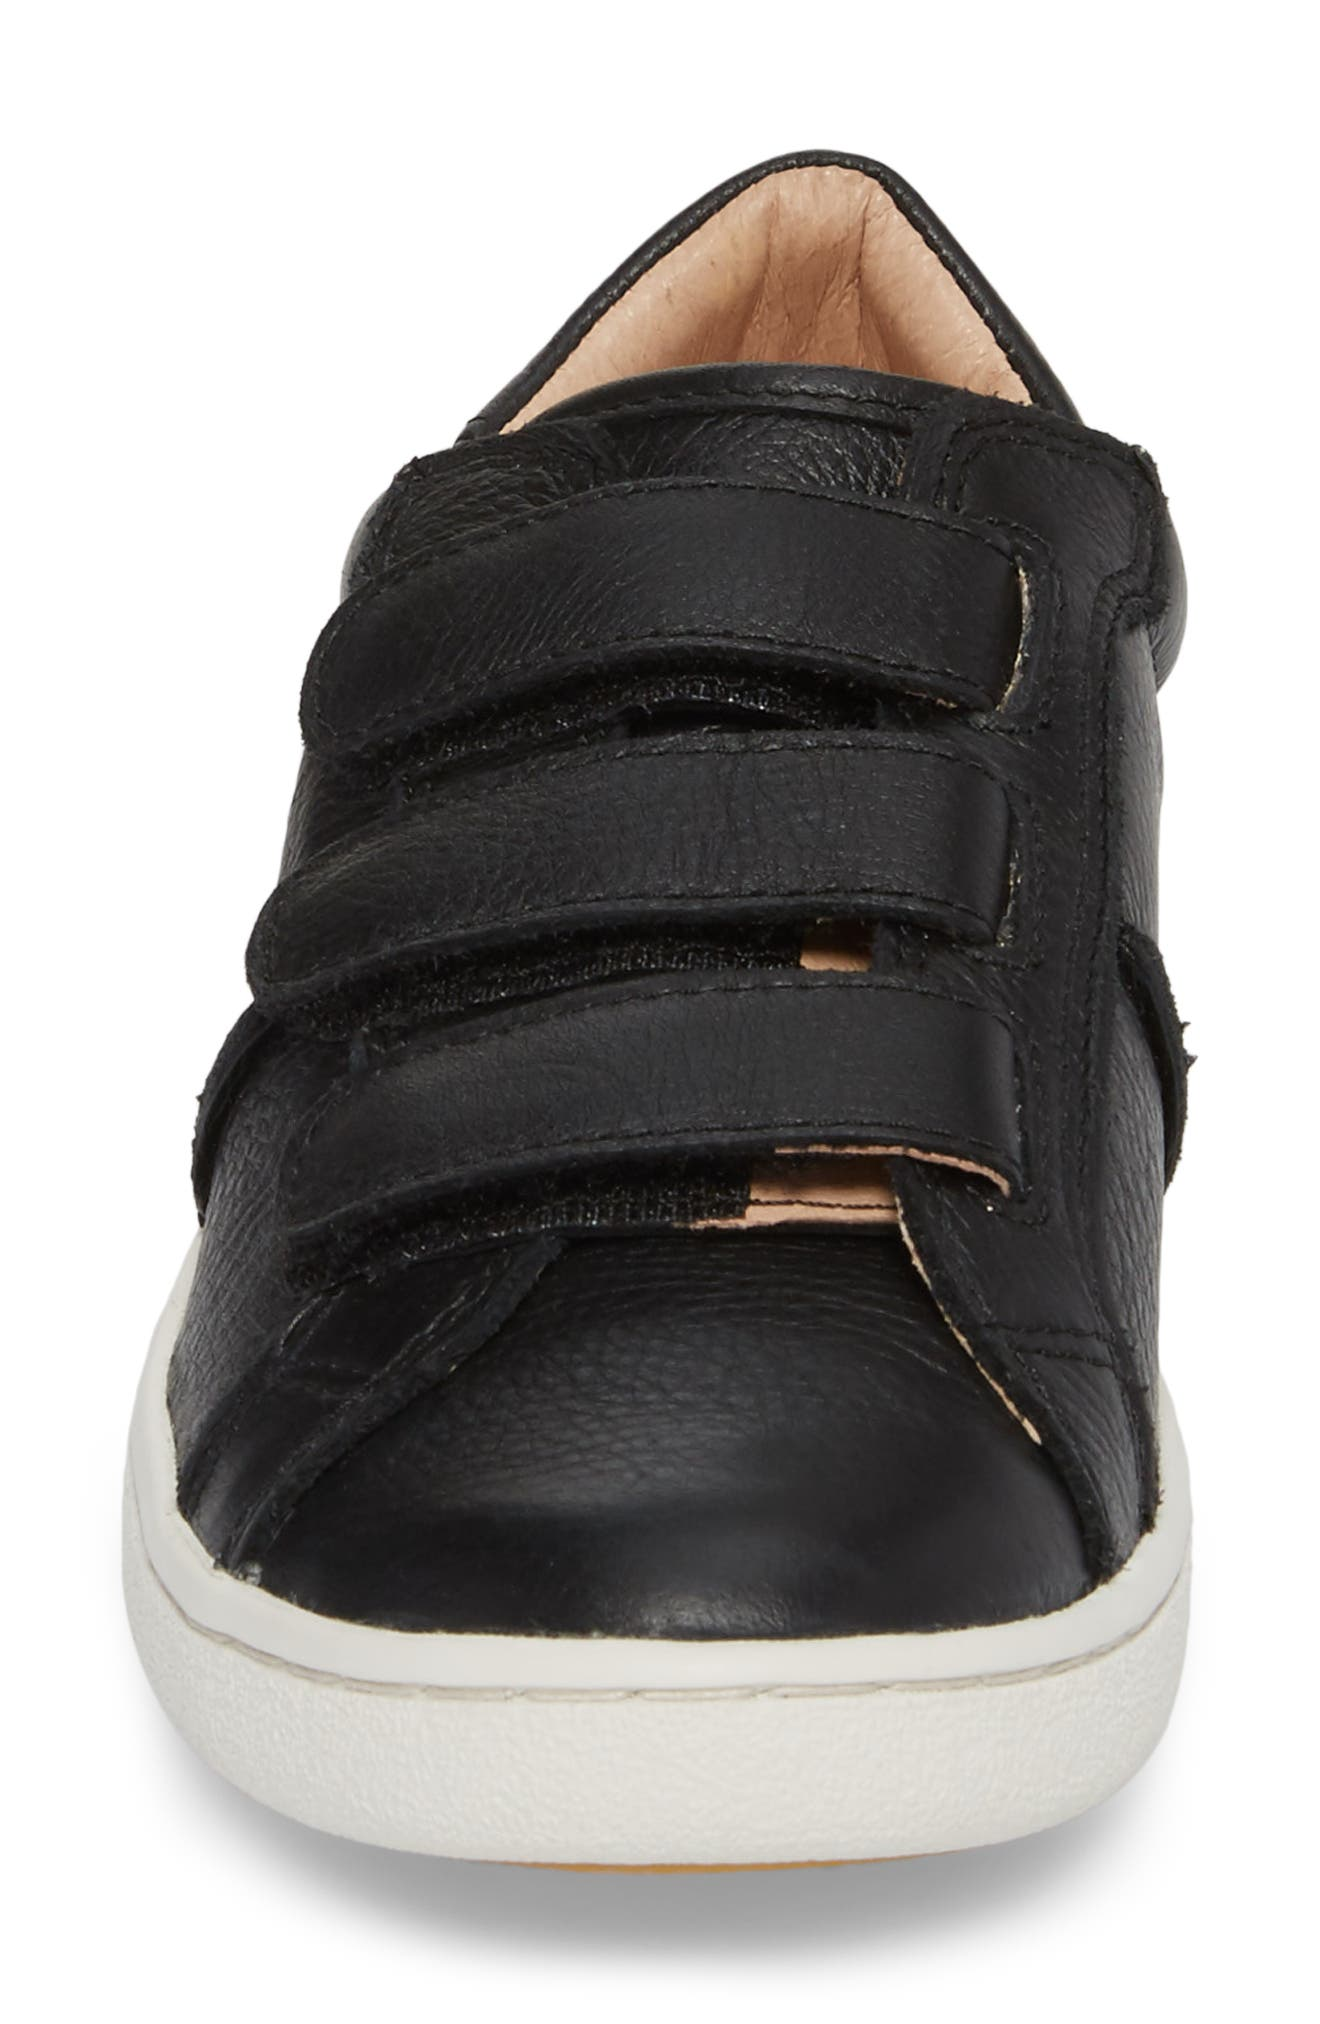 UGG<SUP>®</SUP>, Alix Sneaker, Alternate thumbnail 4, color, 001